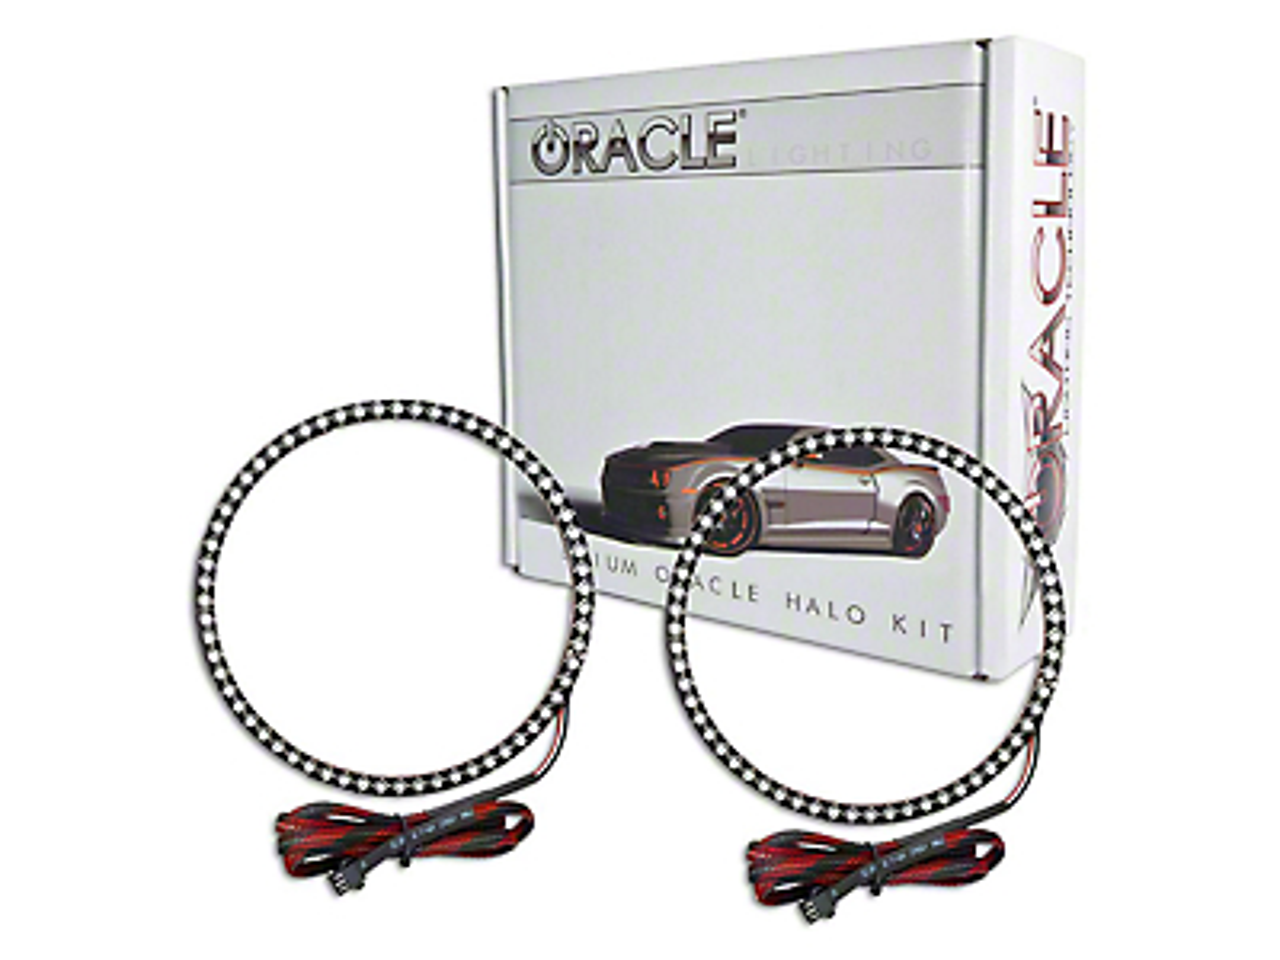 Oracle Dynamic ColorSHIFT Headlight Halo Conversion Kit (97-06 Jeep Wrangler TJ)